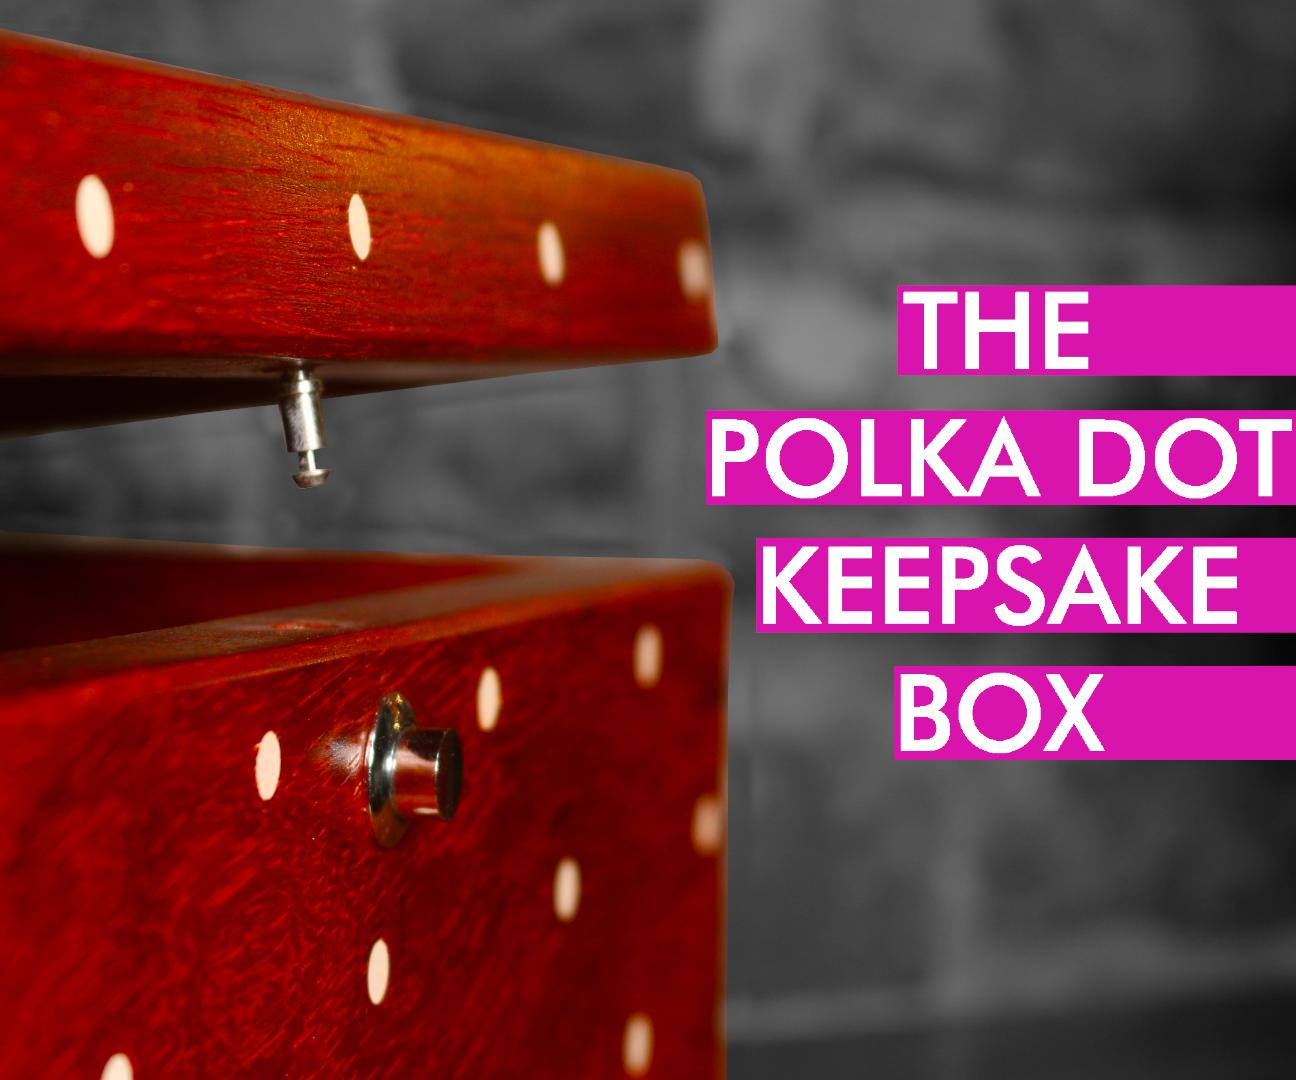 The Polka Dot Keepsake Box